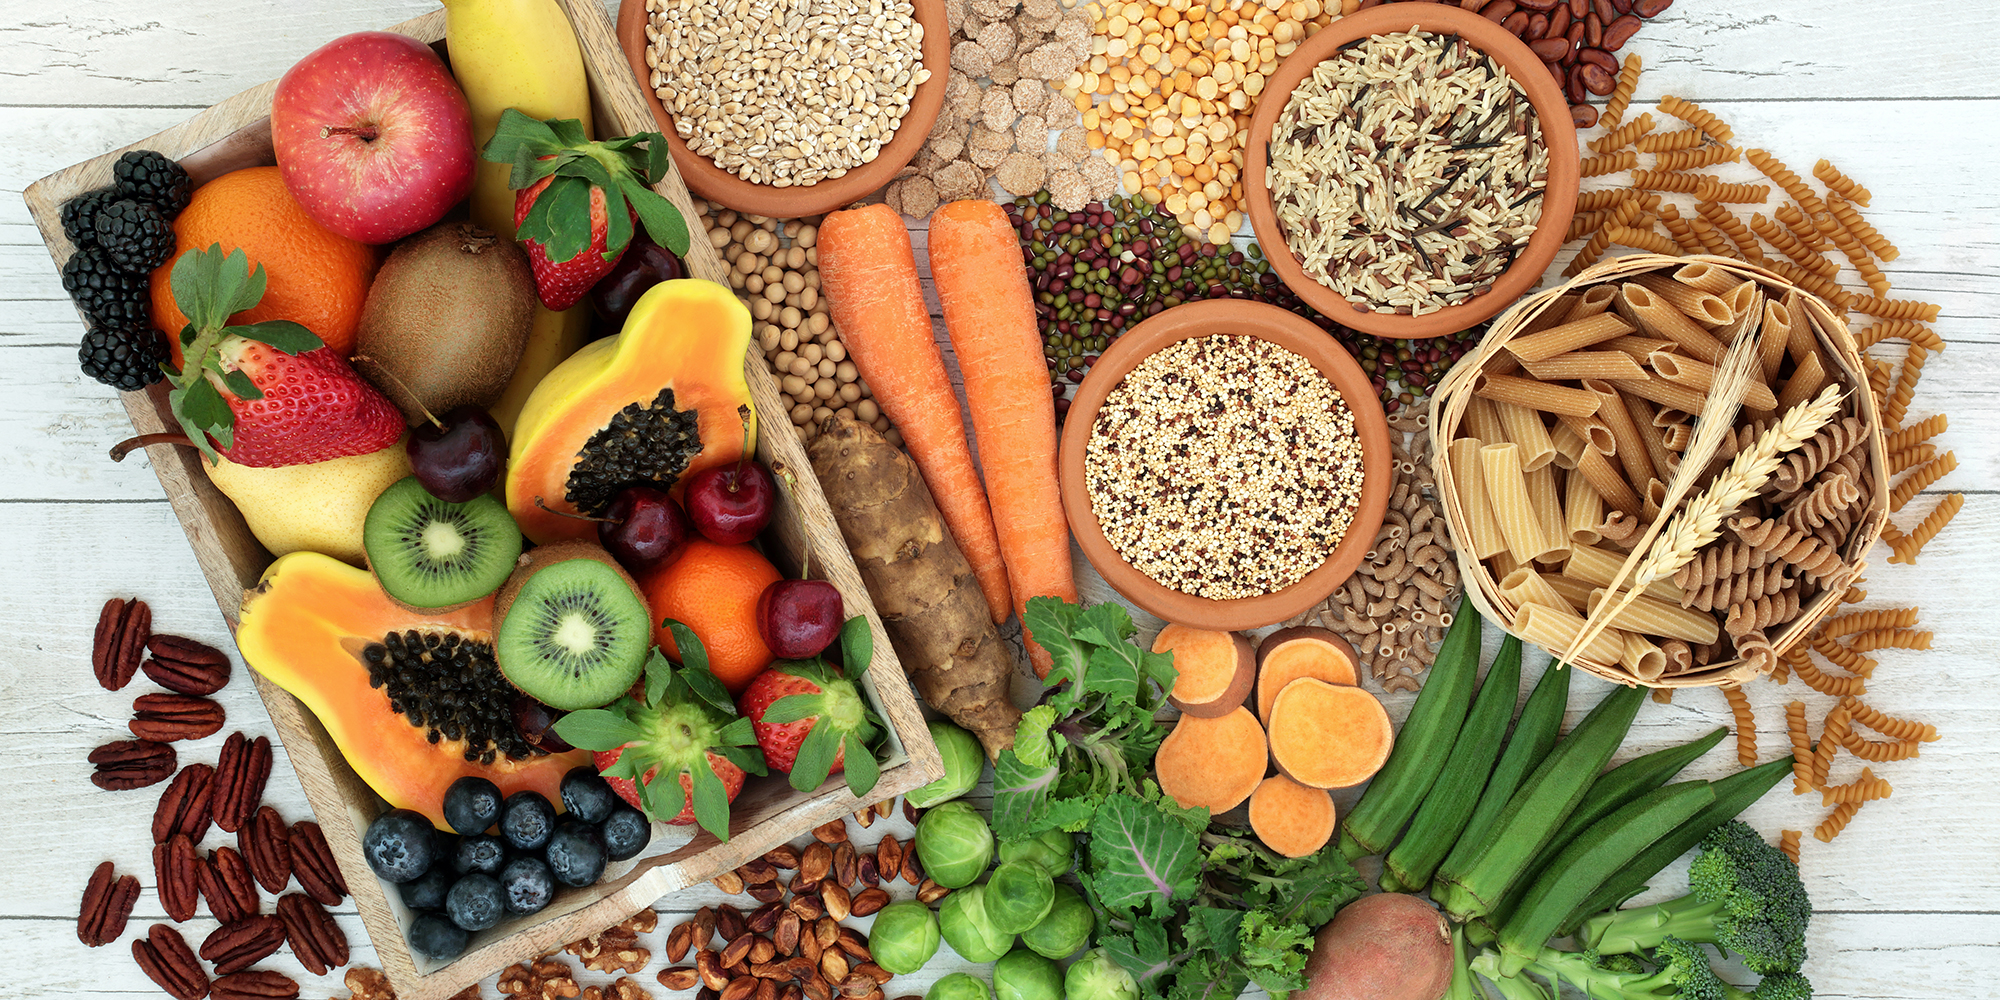 high fiber foods diet plan | fruits vegetables grains